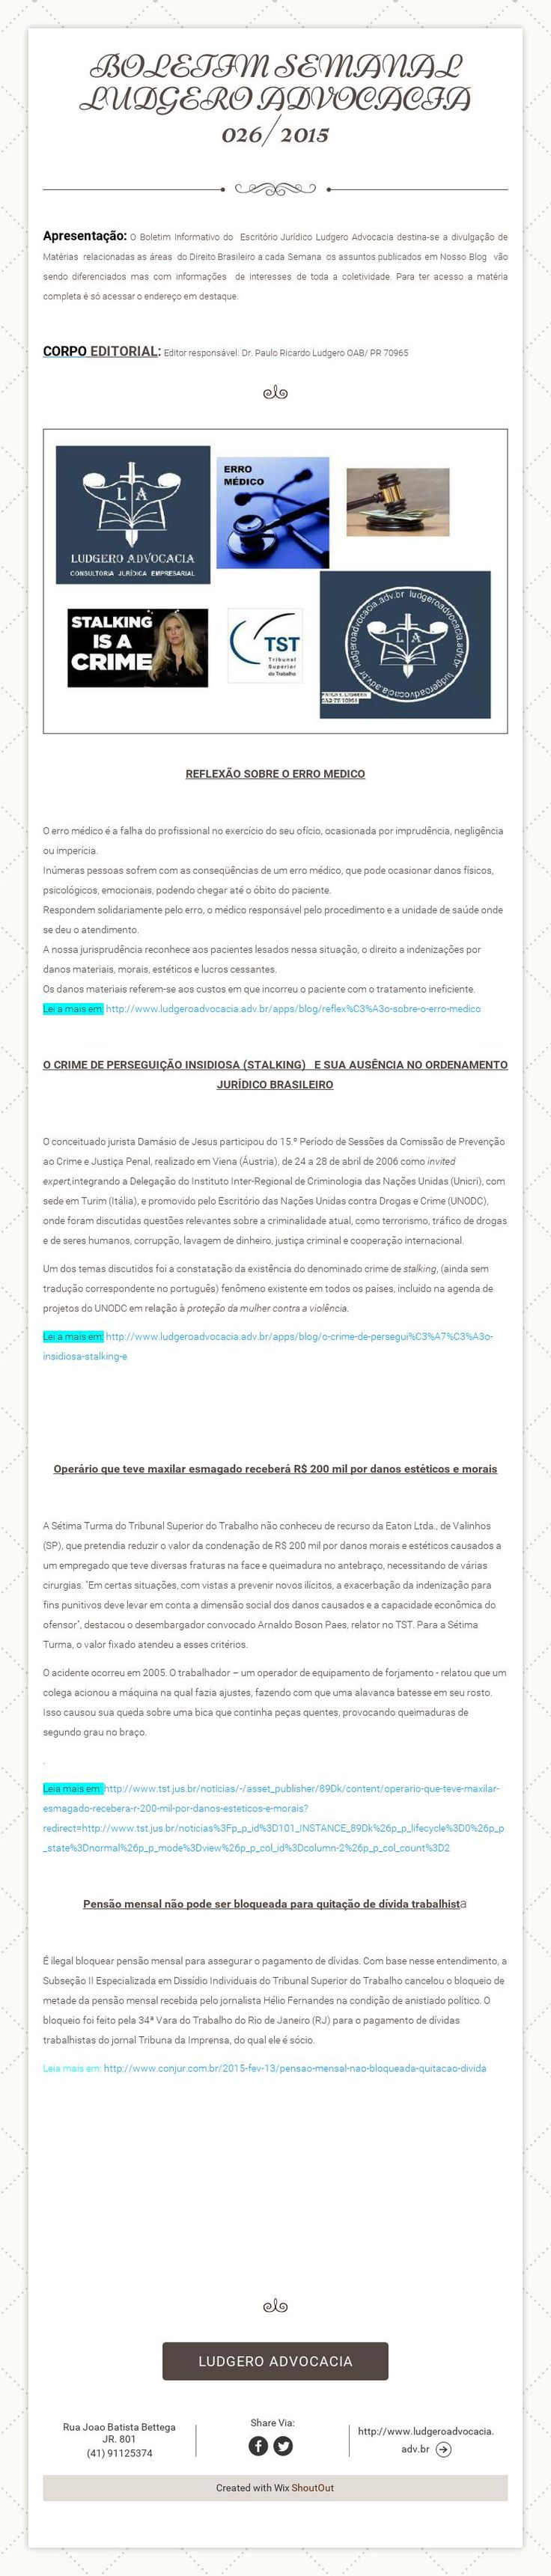 BOLETIM SEMANAL LUDGERO ADVOCACIA026/2015